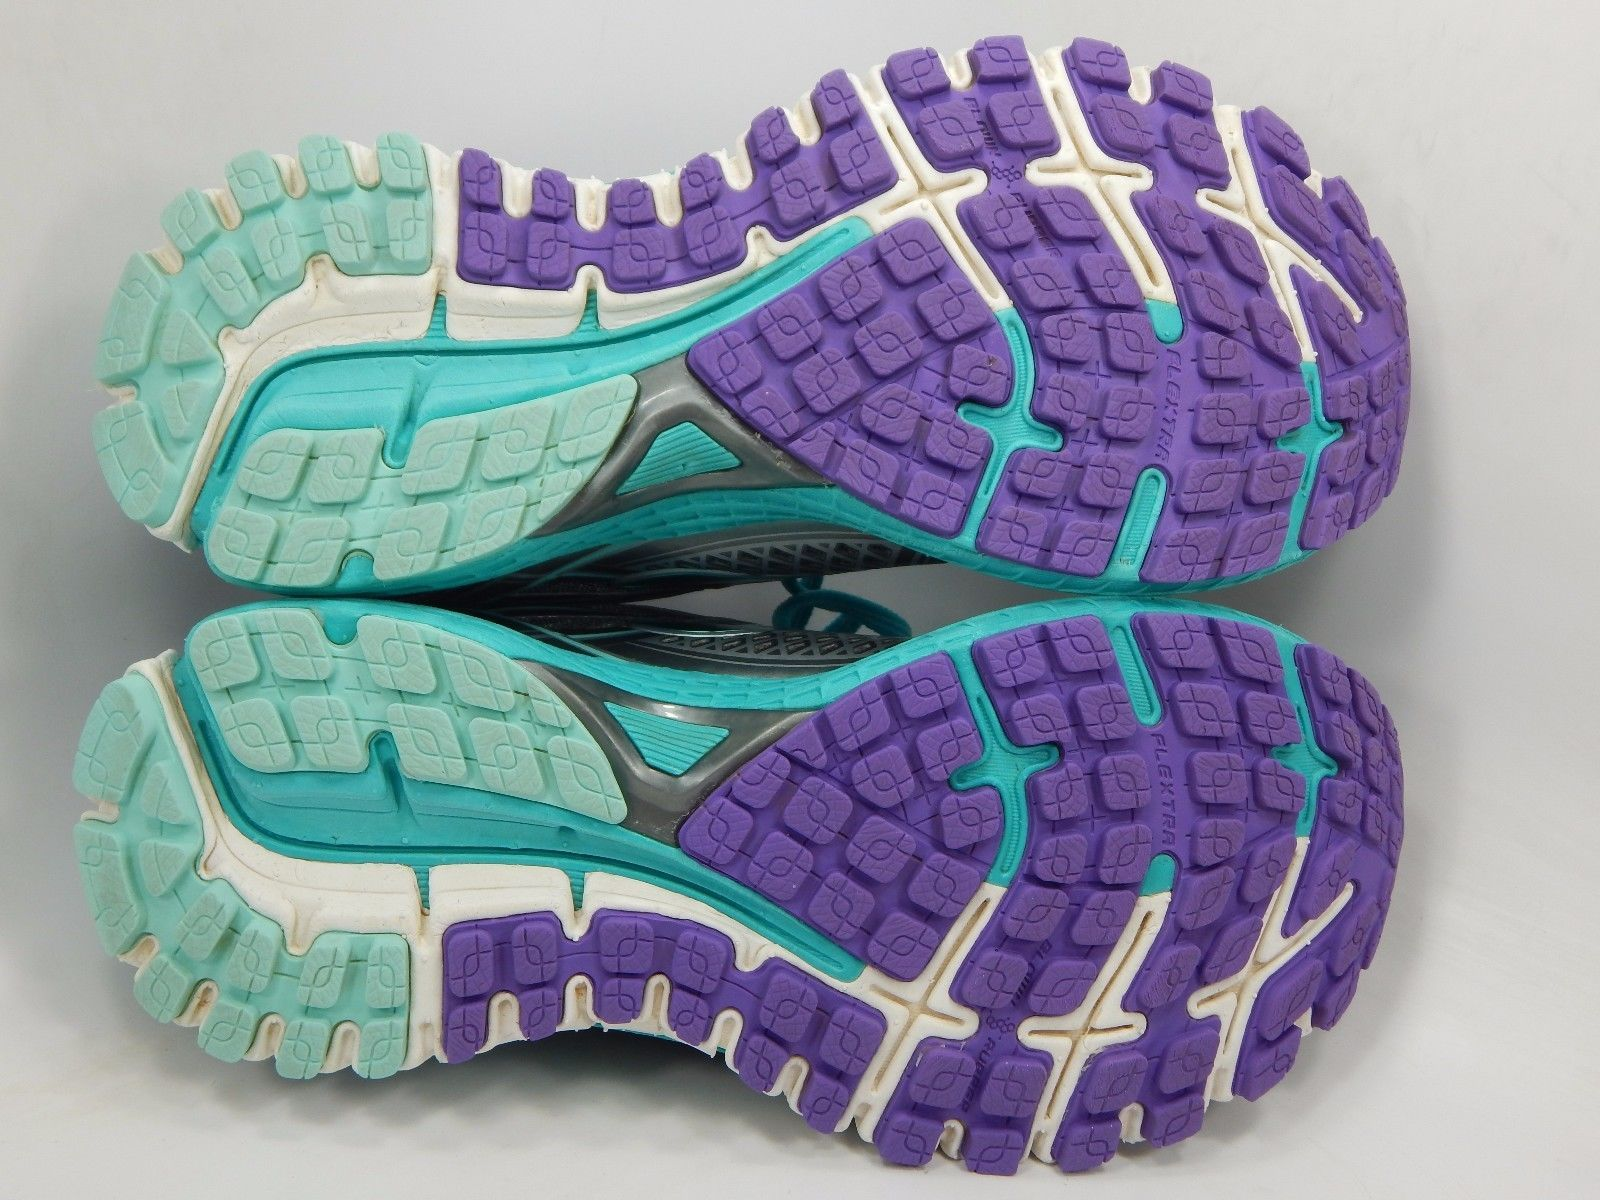 693dadb54bde0 Brooks Defyance 9 Women s Running Shoes Size US 8 M (B) EU 39 Silver